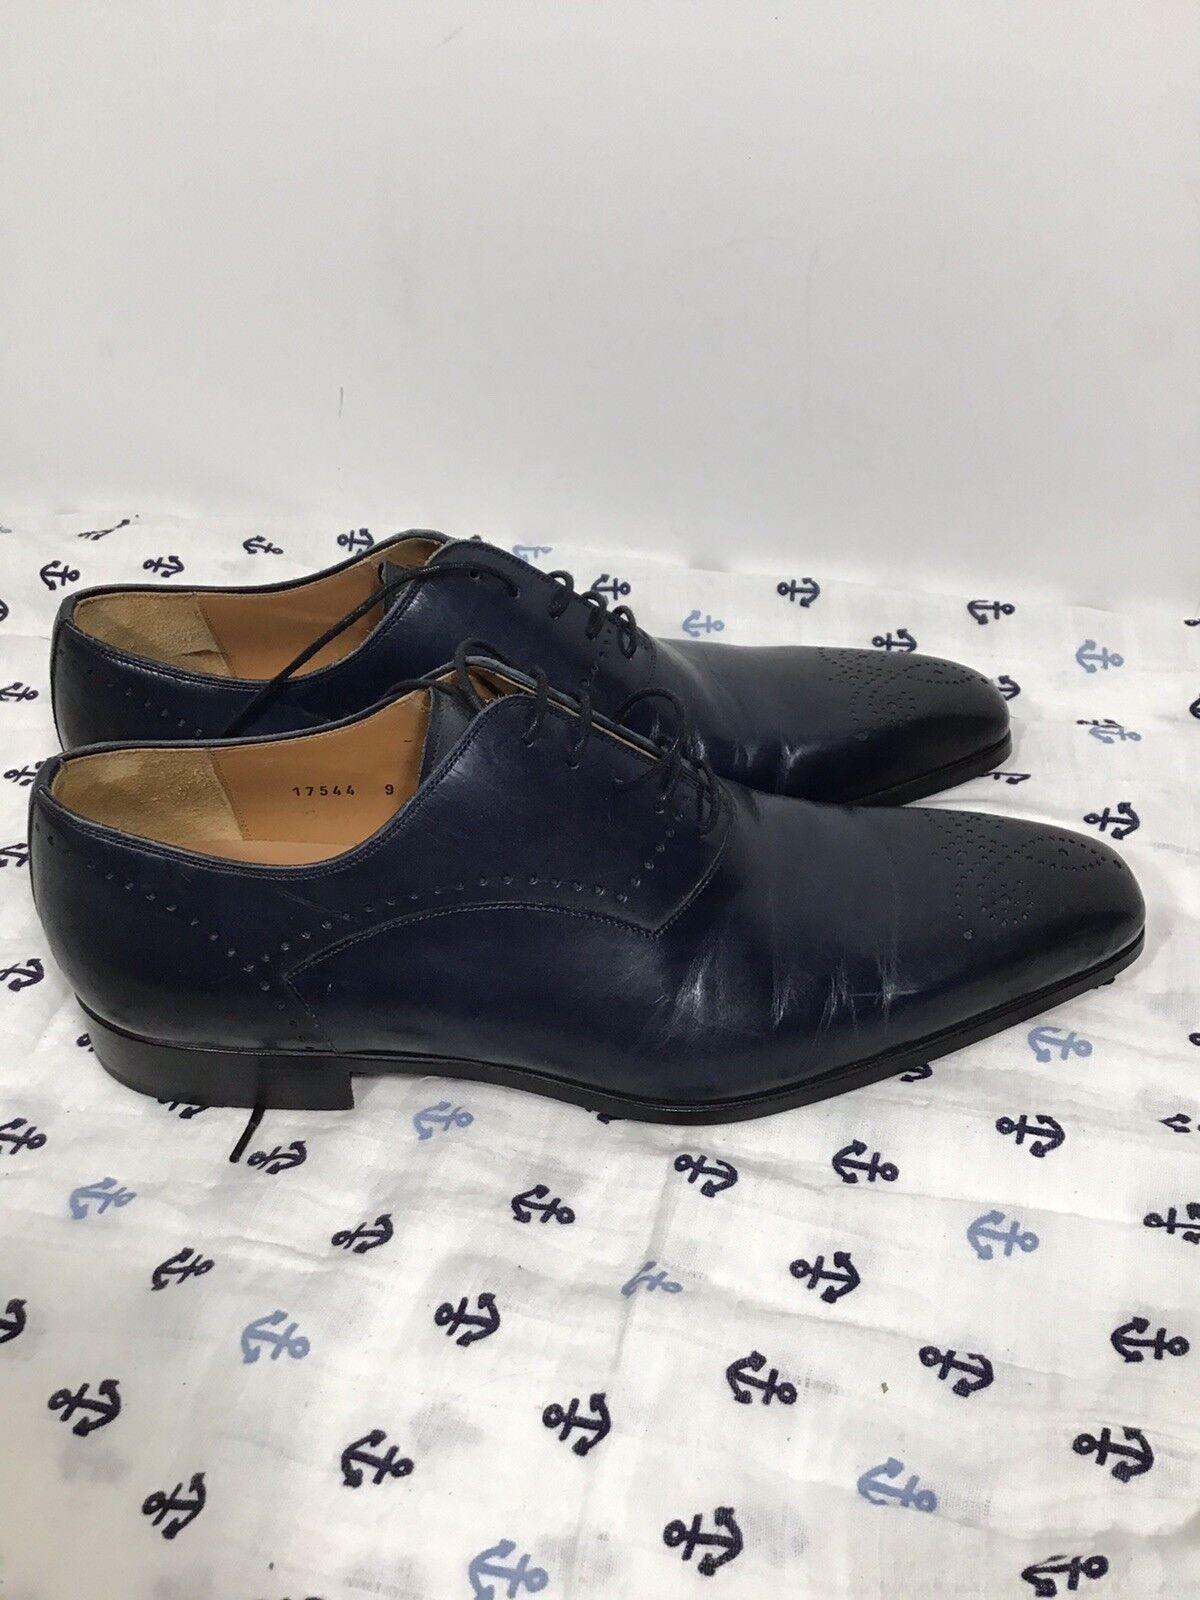 Men's MAGNANNI 'Adolfo' Navy blu Leather Medallion Toe Oxfords Dimensione US 9